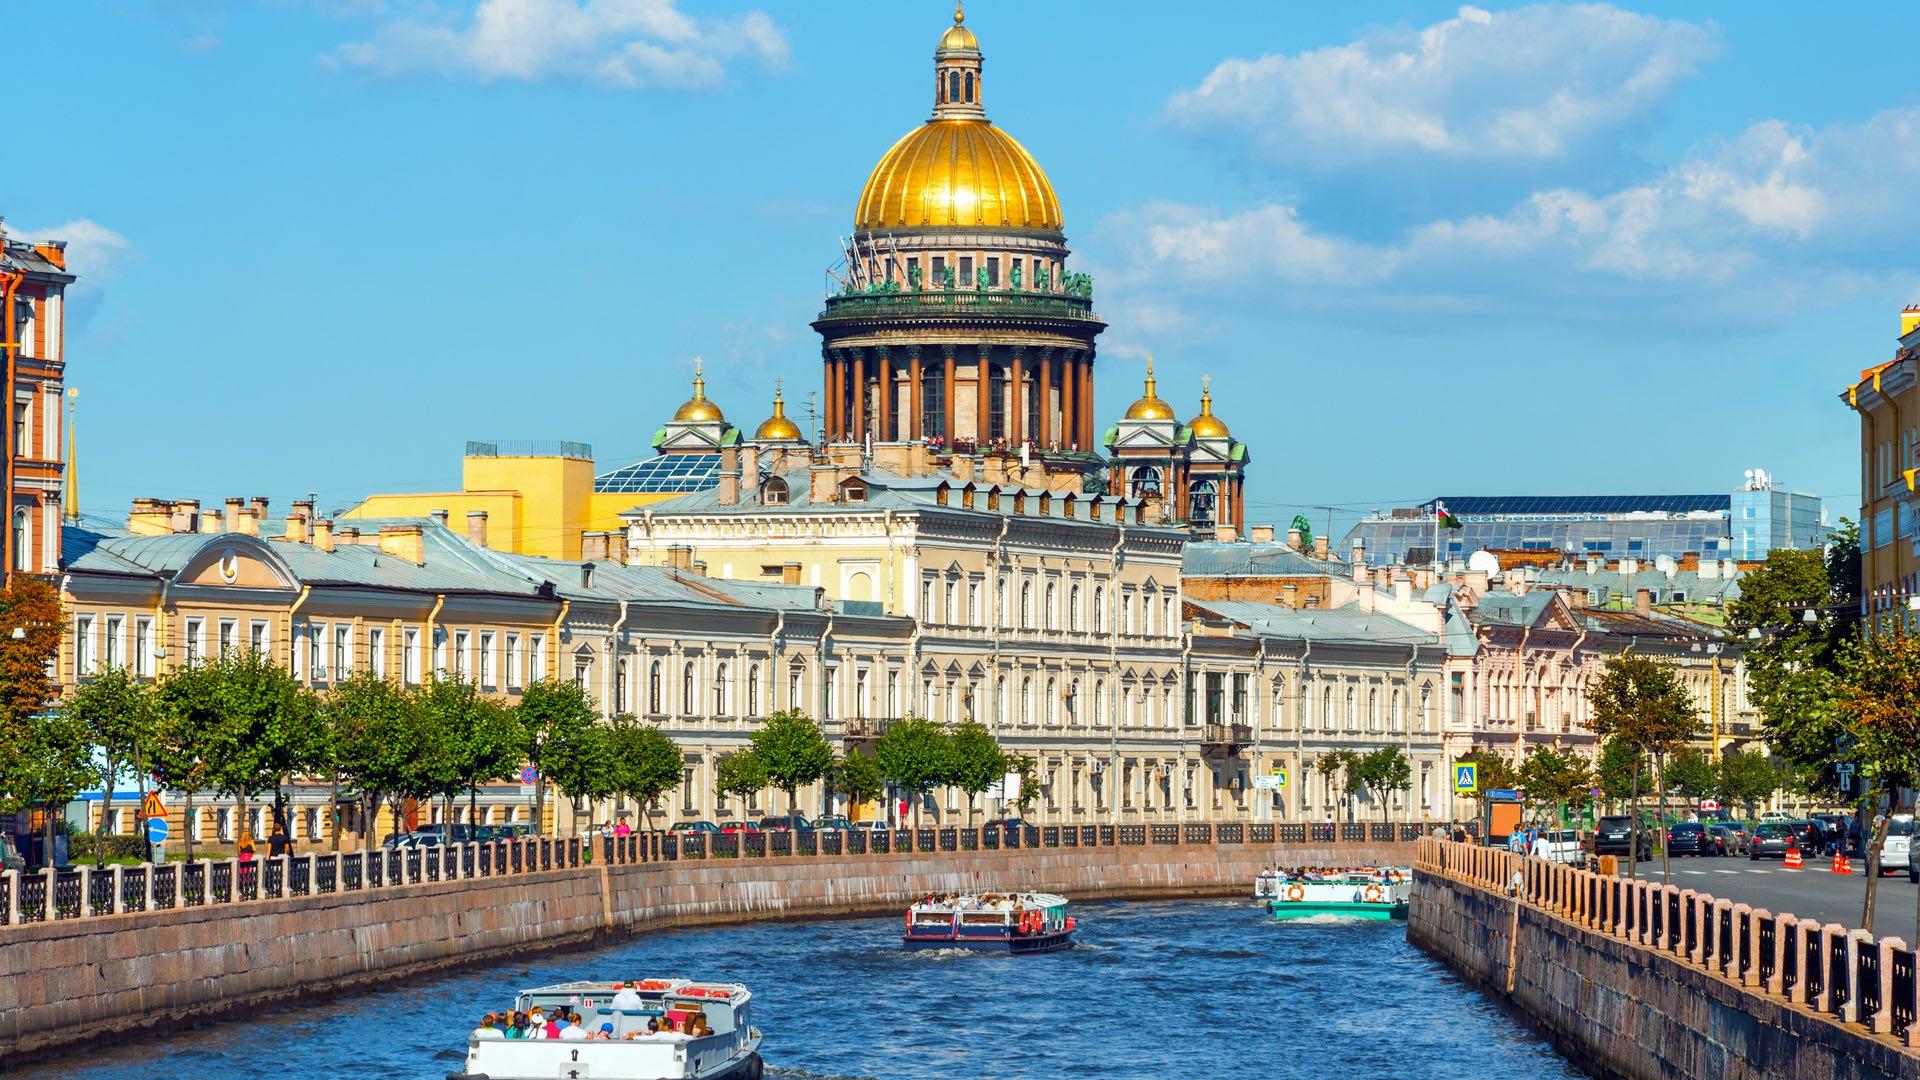 Russland | St. Petersburg | ©Roman Evgenev/Shutterstock.com